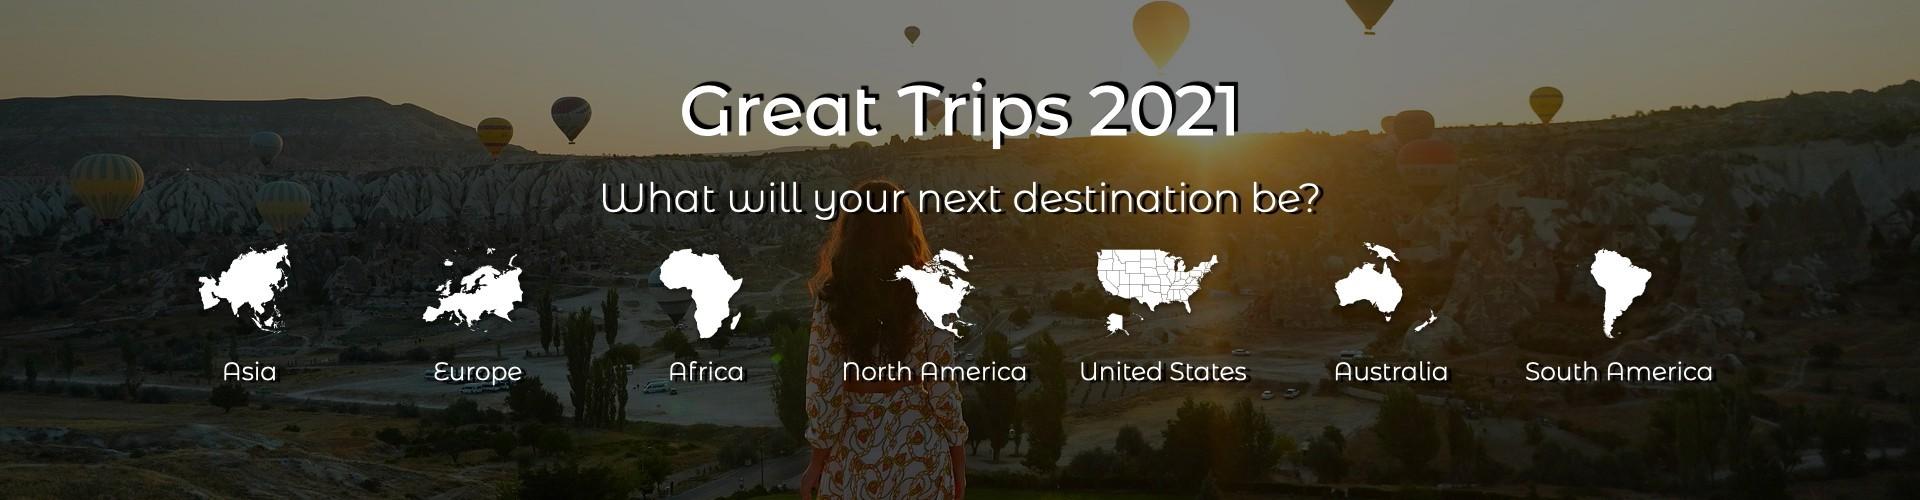 Great Trips 2021